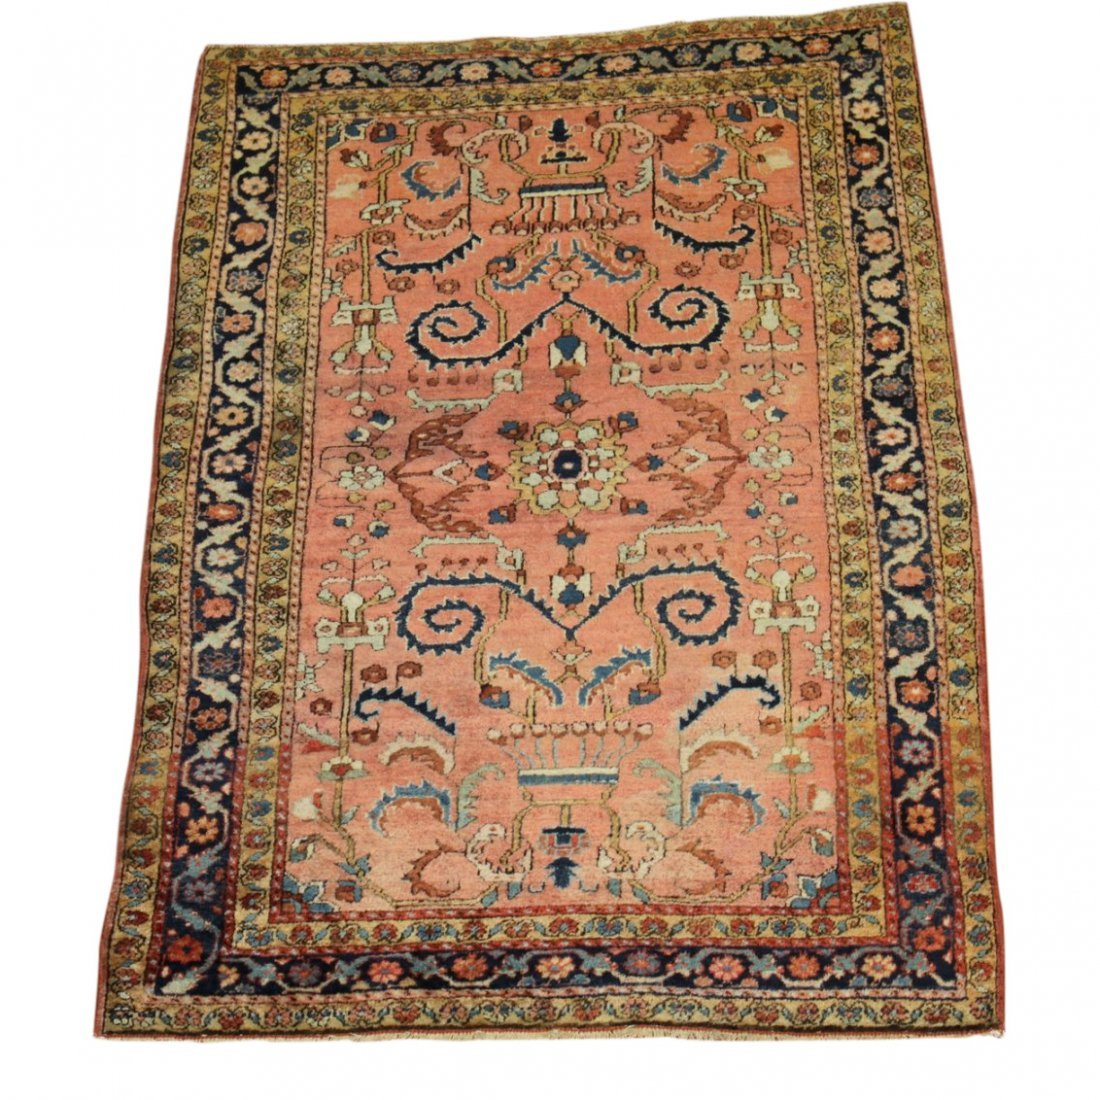 Handmade Antique Persian Sarouk 3x5